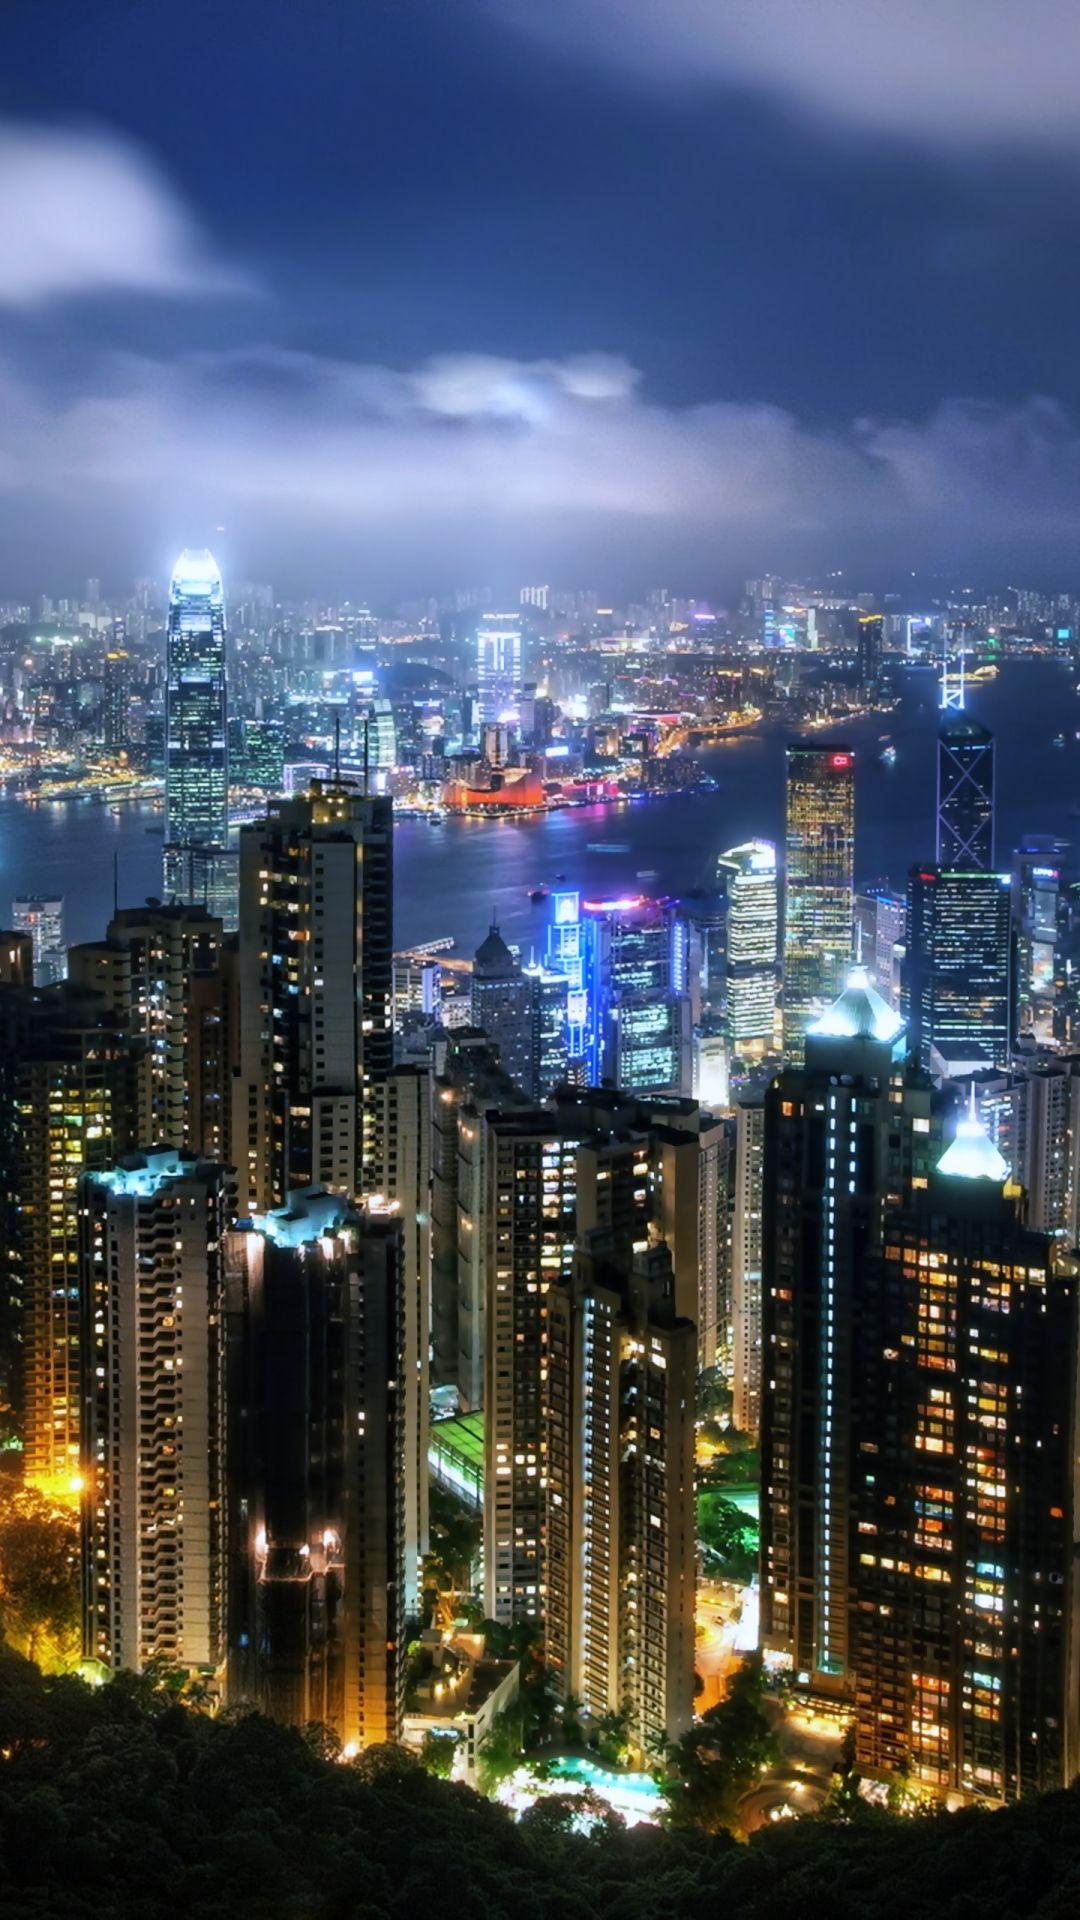 Man Made Hong Kong Cities China Building City Light Night